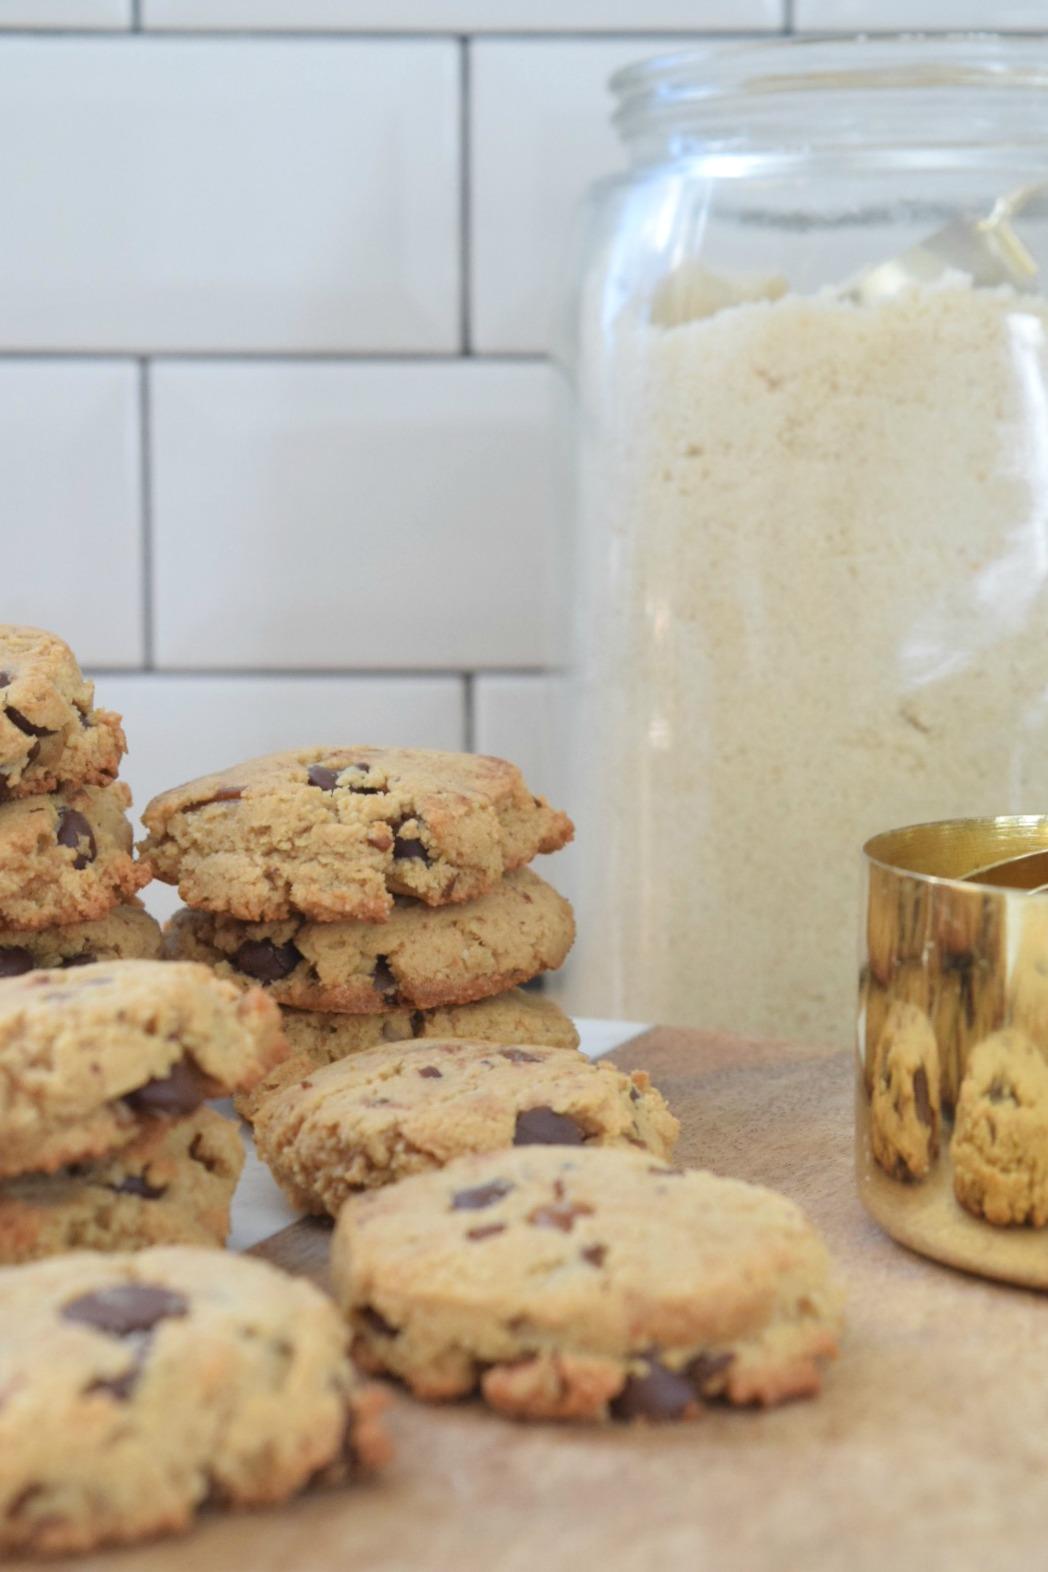 Paleo Chocolate Chip Cookies- My go-to Paleo Dessert